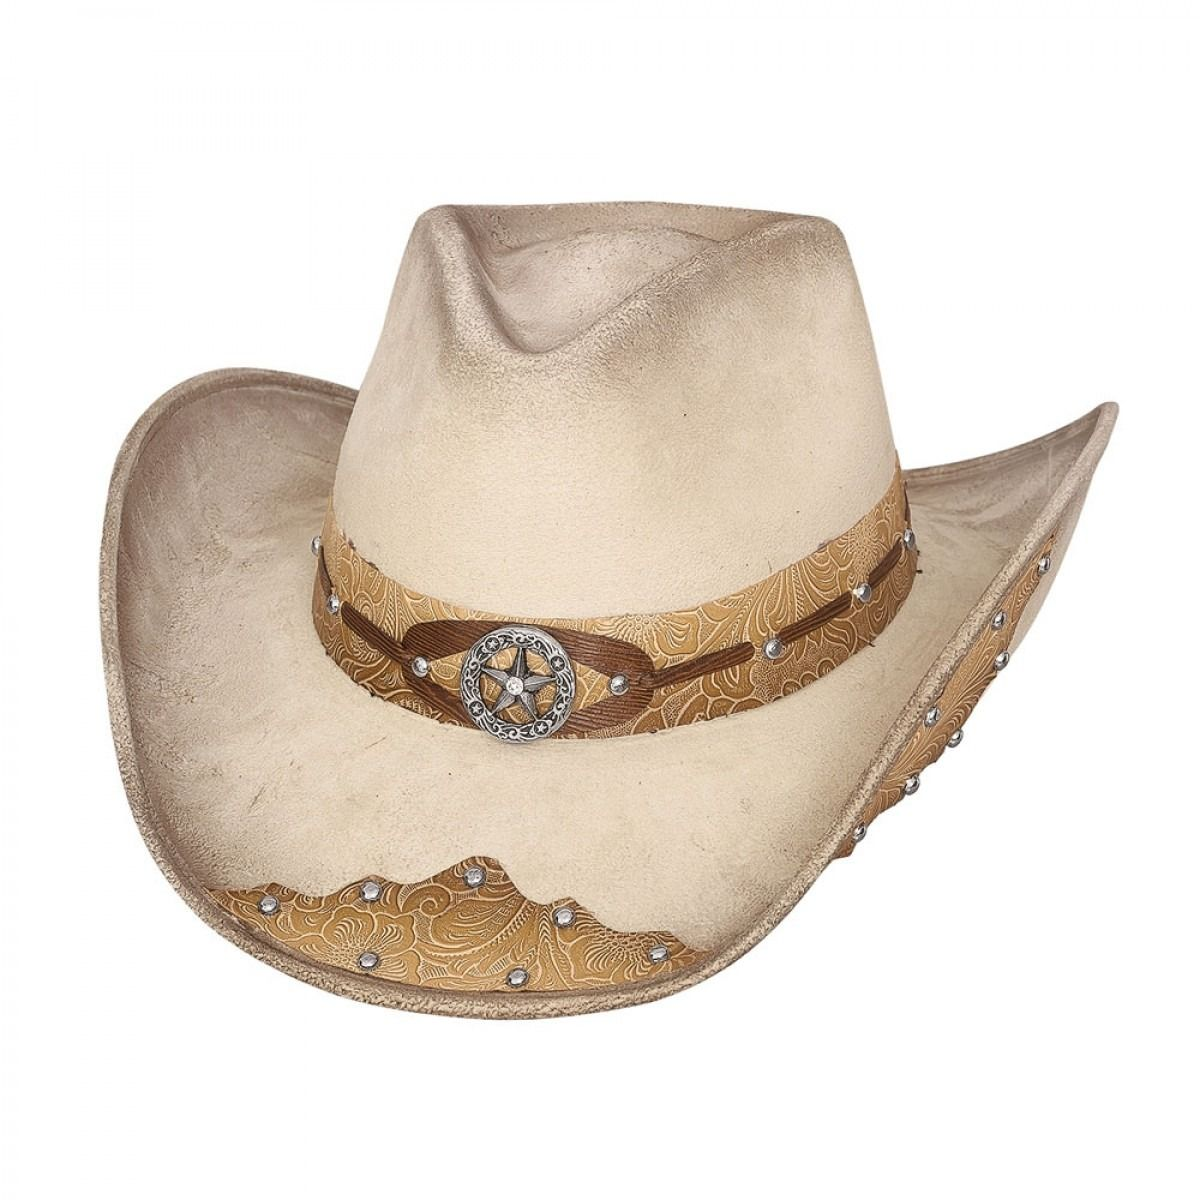 Bullhide Kick the Dust Off Wool Cowboy Hat in 2020